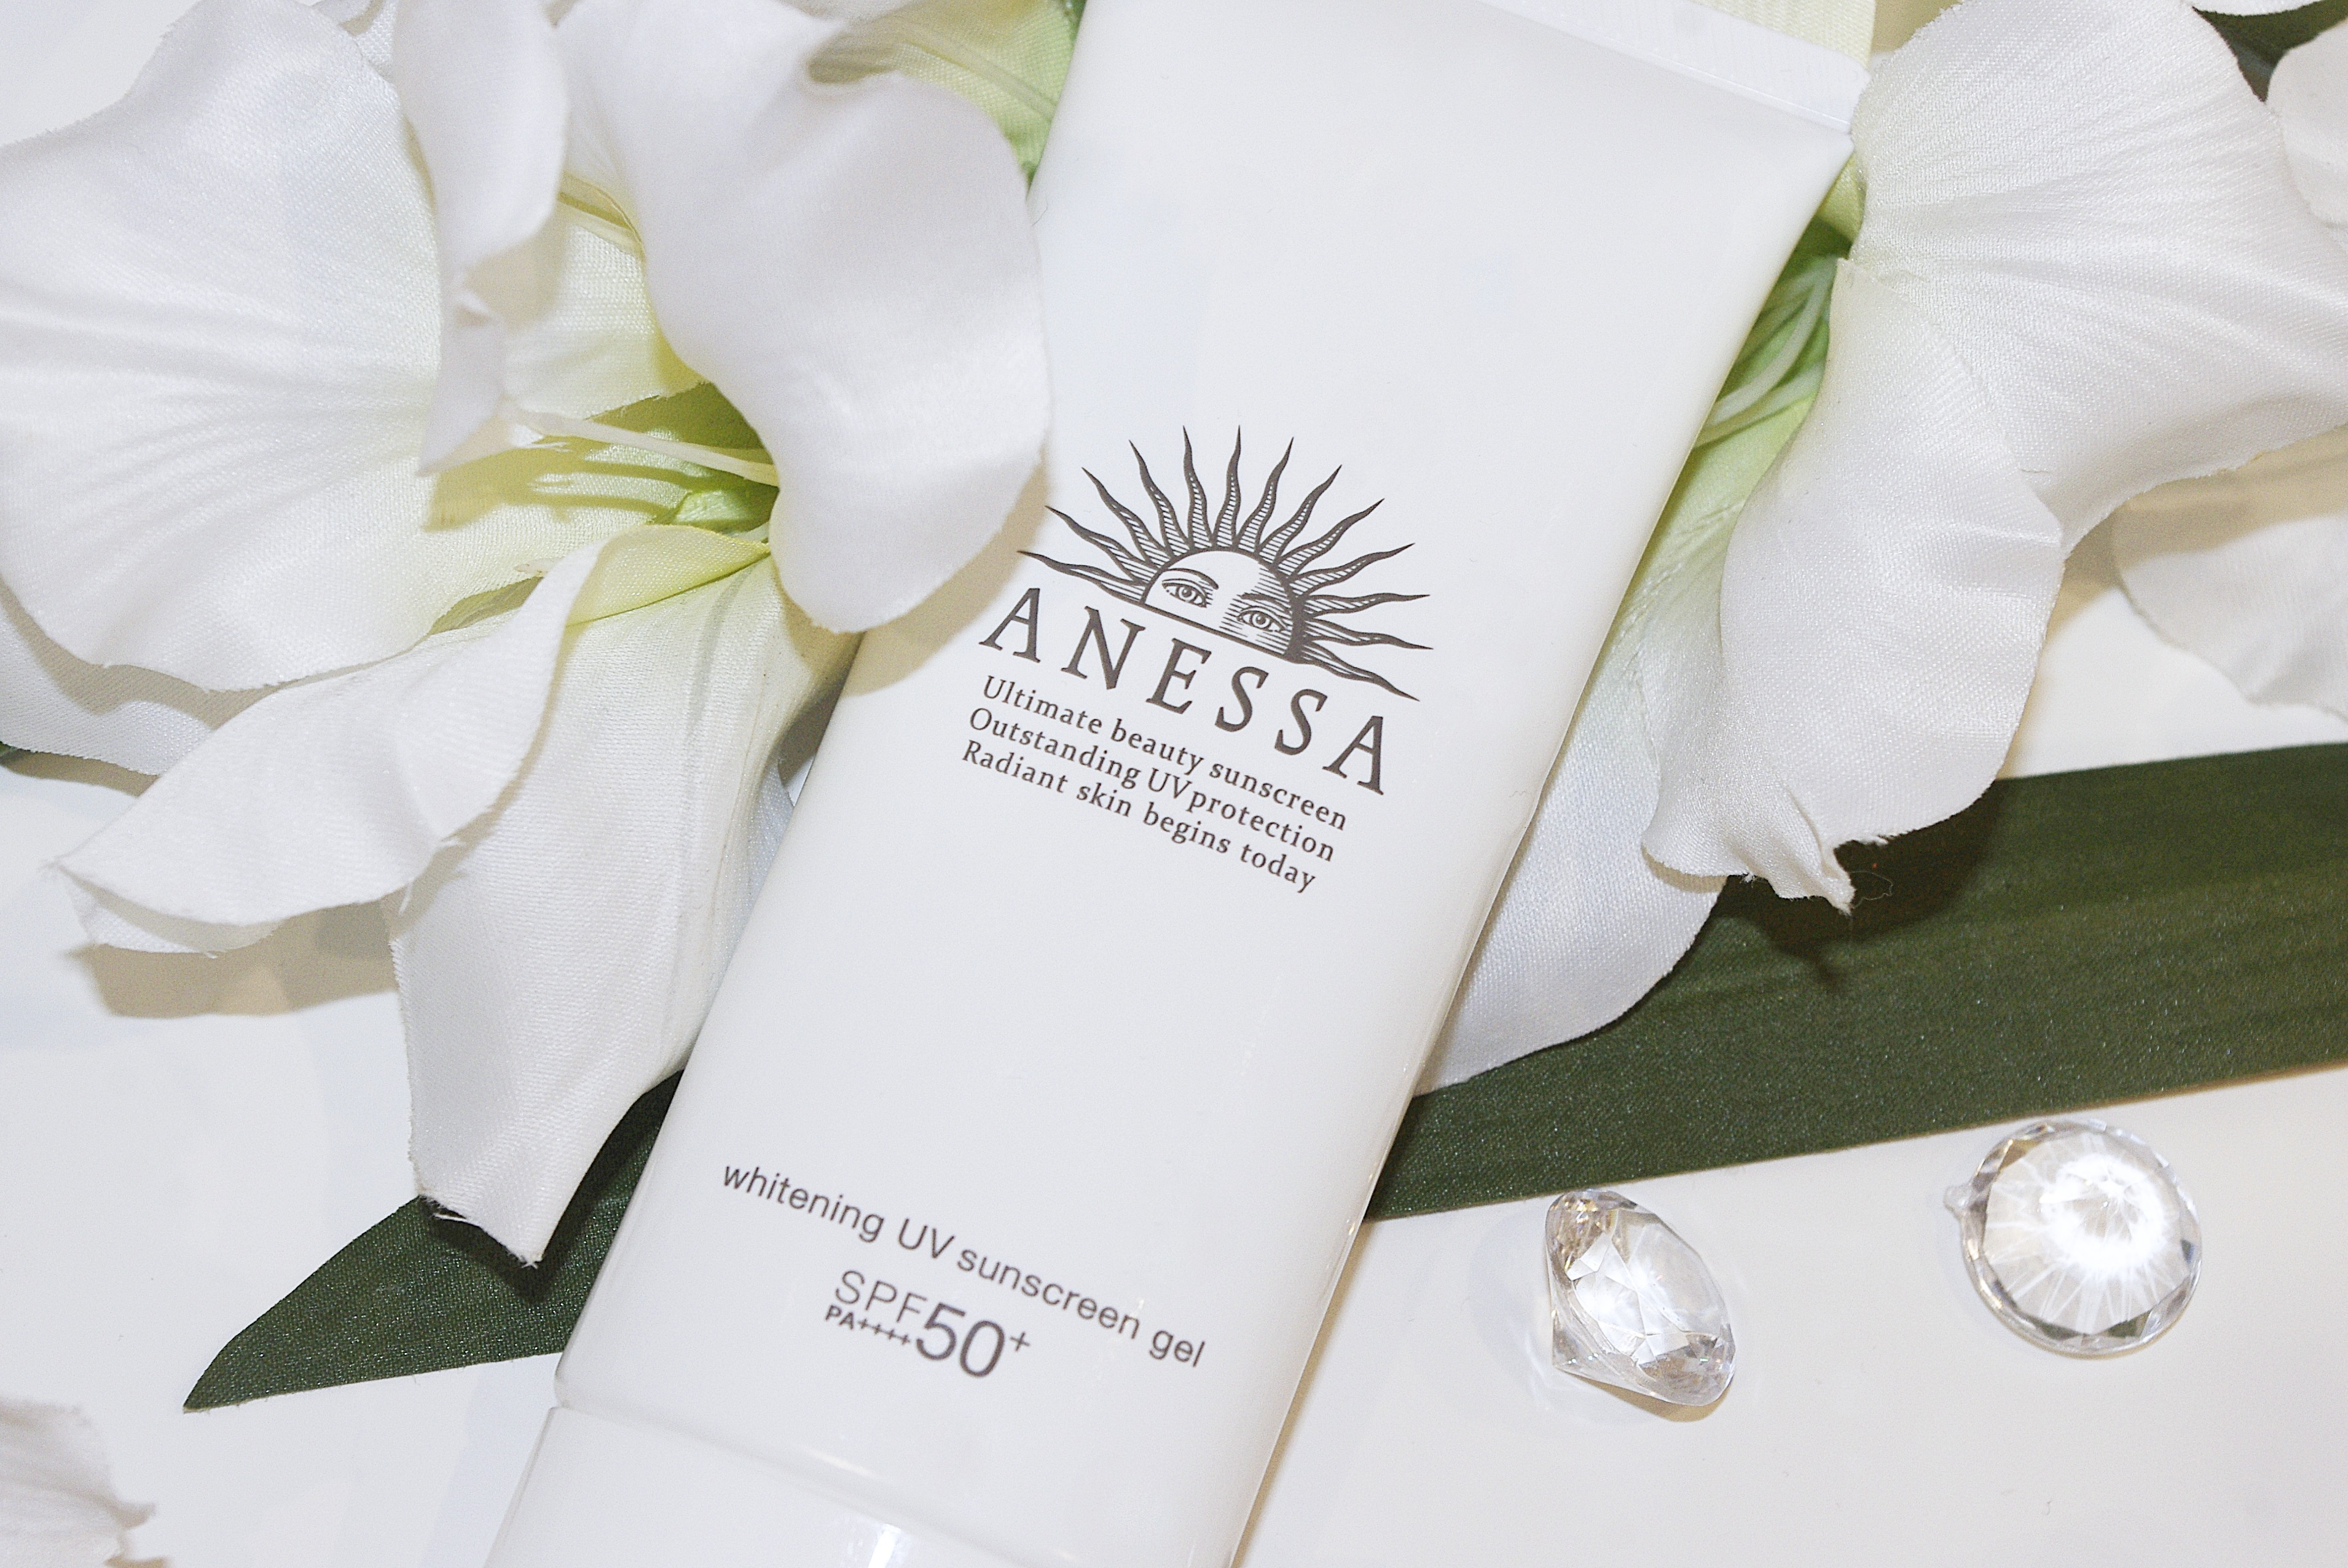 Anessa Whitening UV Sunscreen Gel SPF50+ PA ++++ shiseido